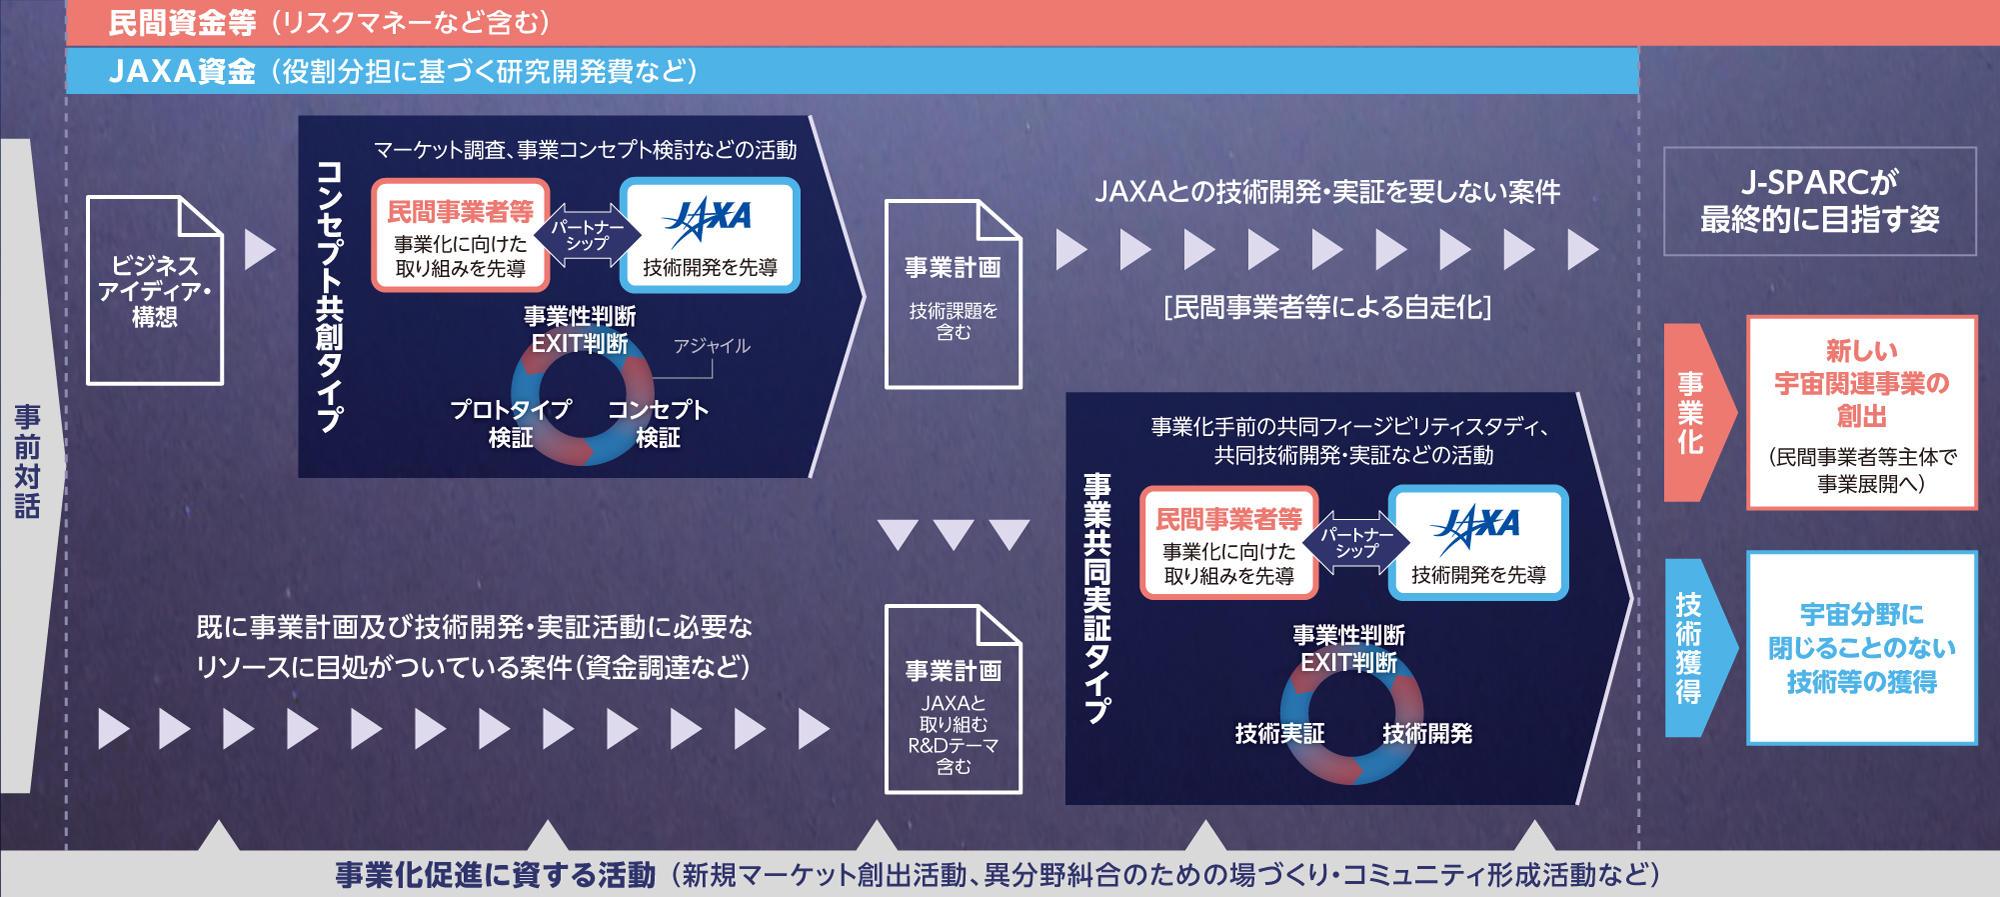 J-SPARC